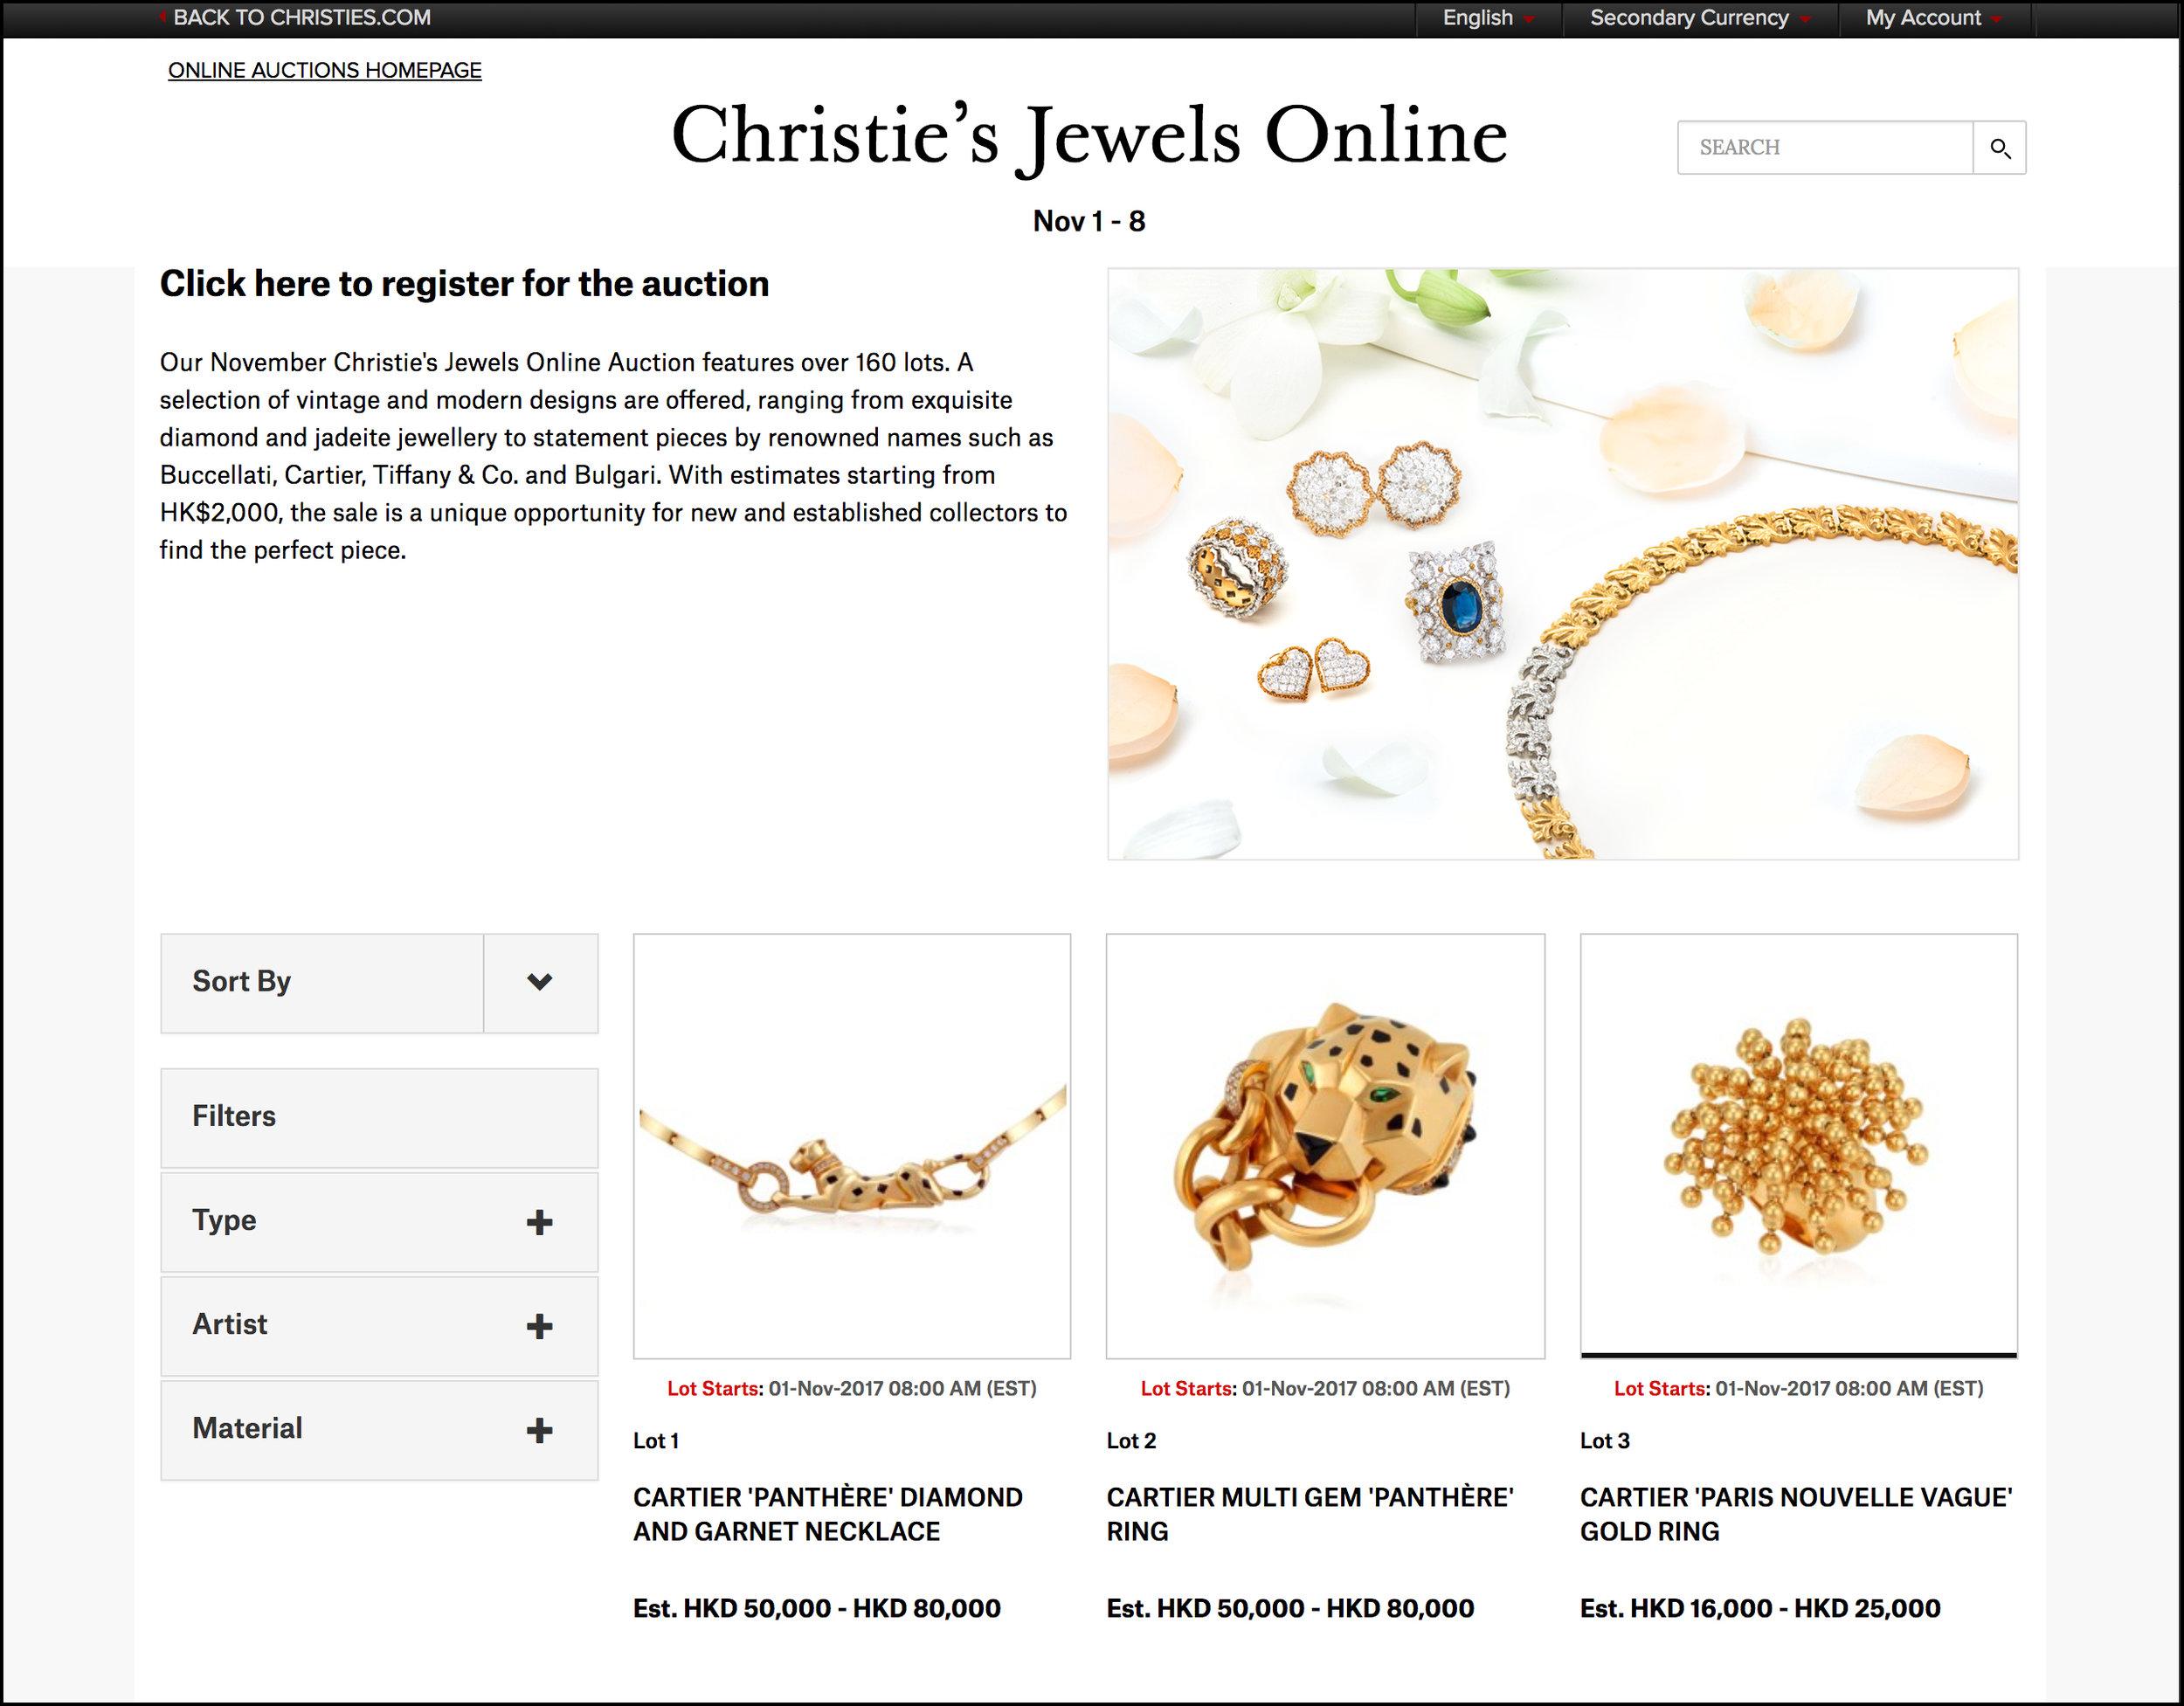 Christies-02.jpg